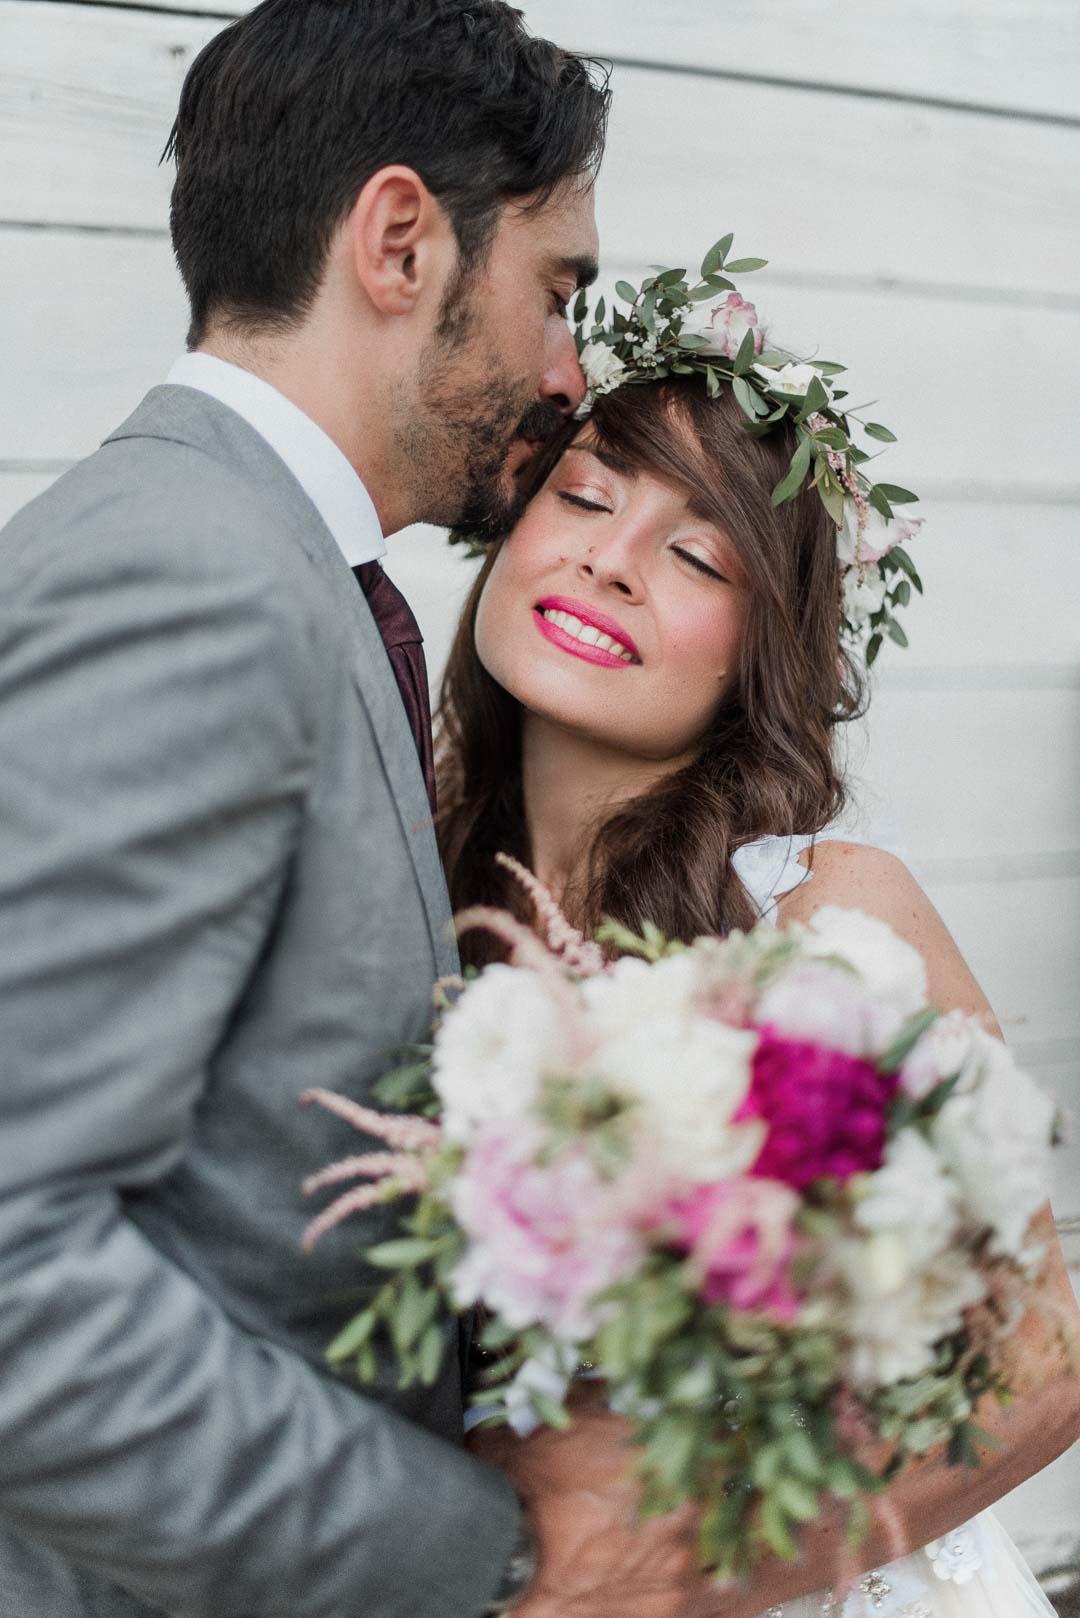 wedding-photographer-destination-fineart-bespoke-reportage-amalficoast-torrelacerniola-vivianeizzo-spazio46-67